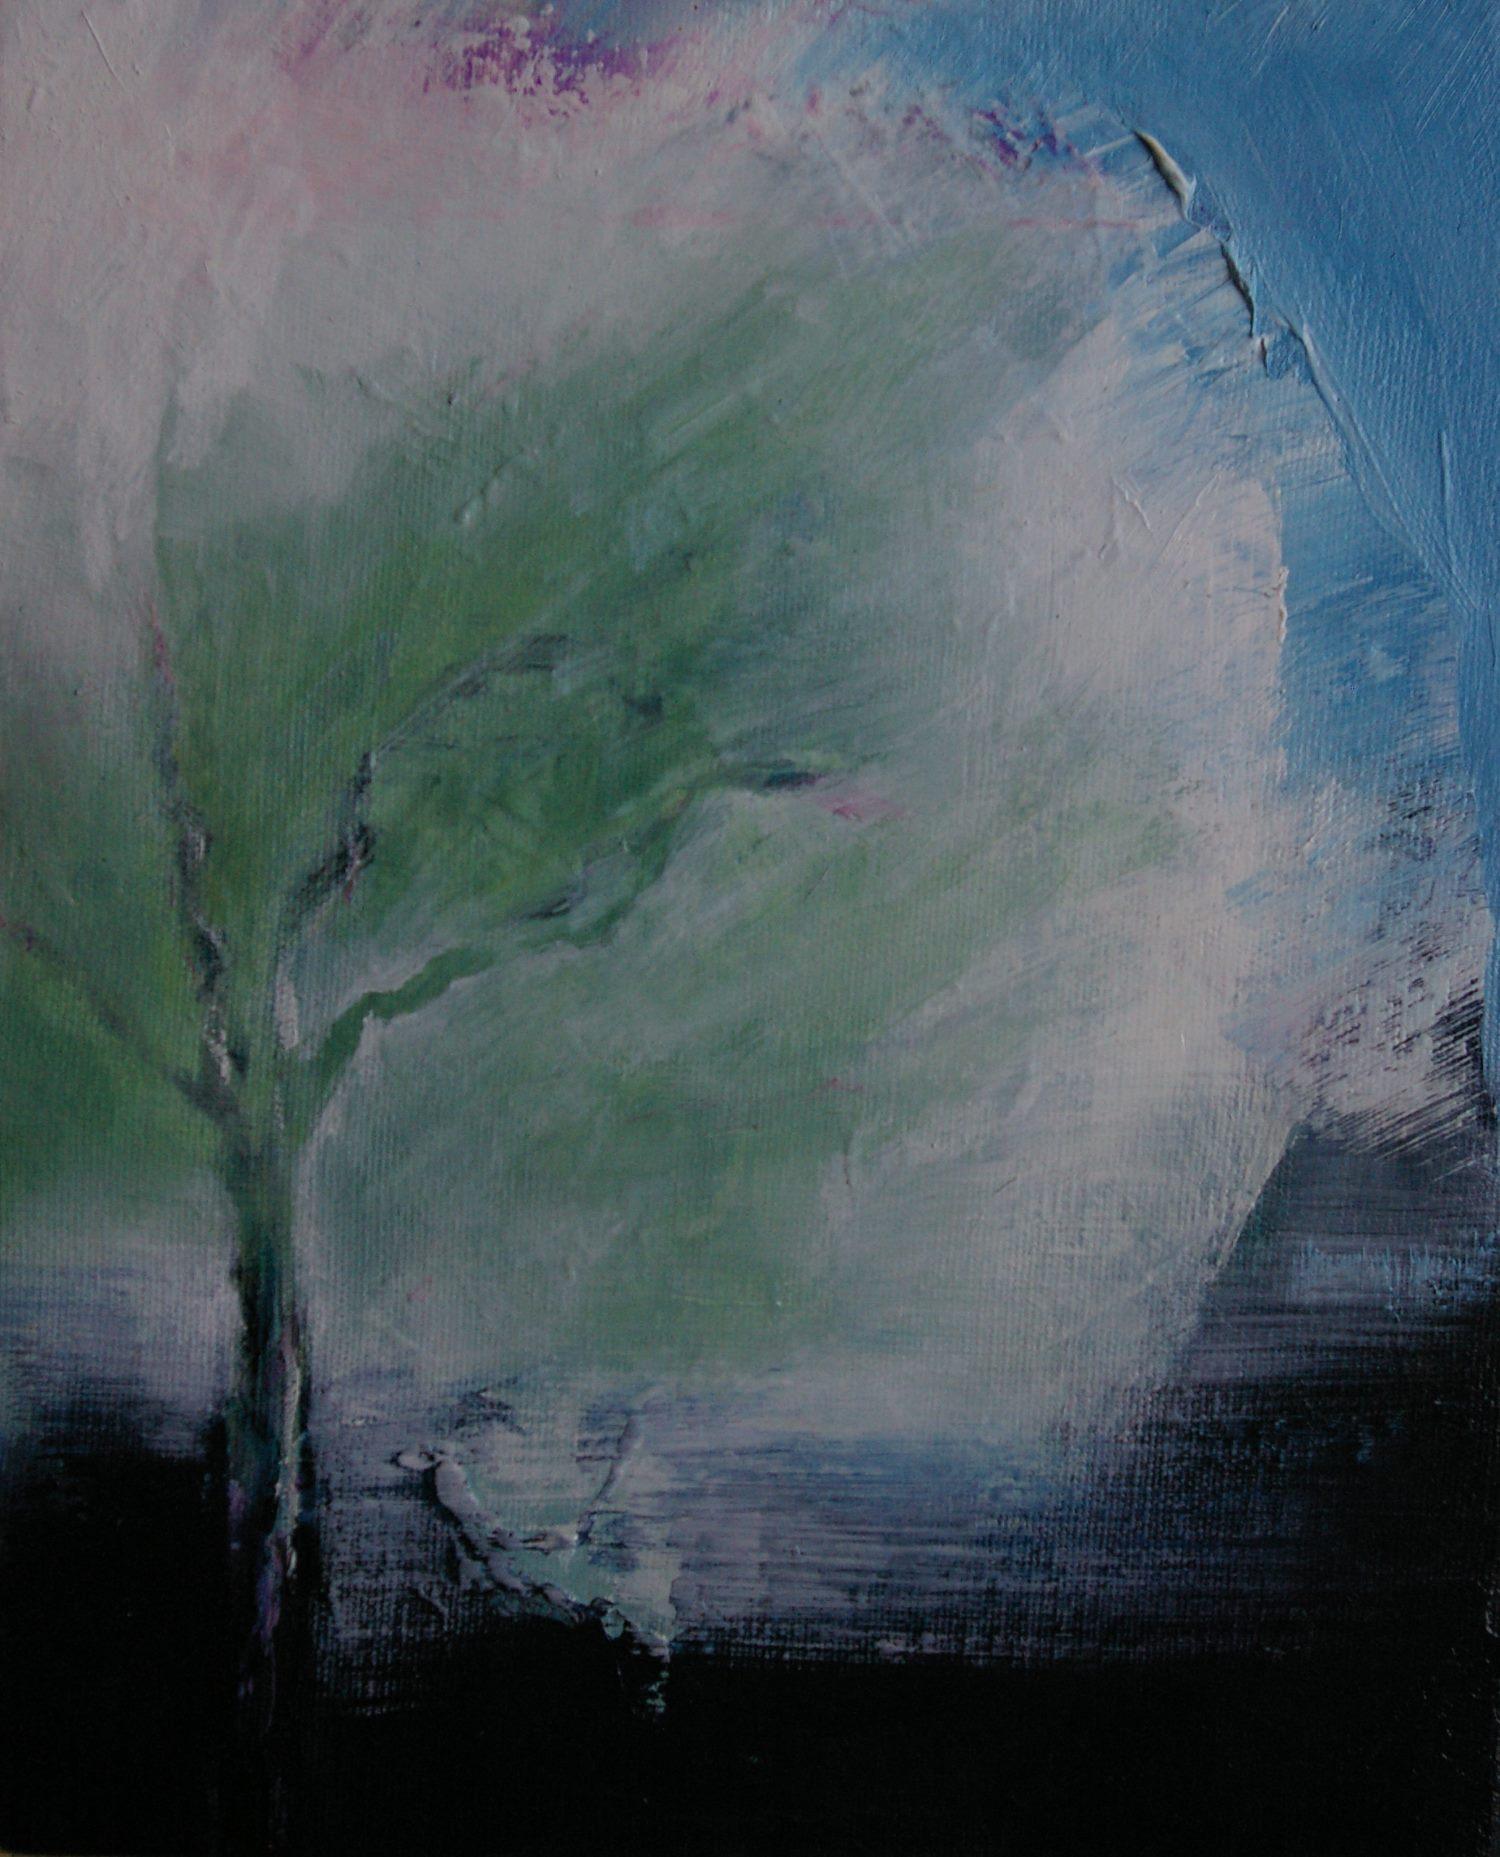 Memories of a walk 2: Plum Tree - Caitriona O'Leary